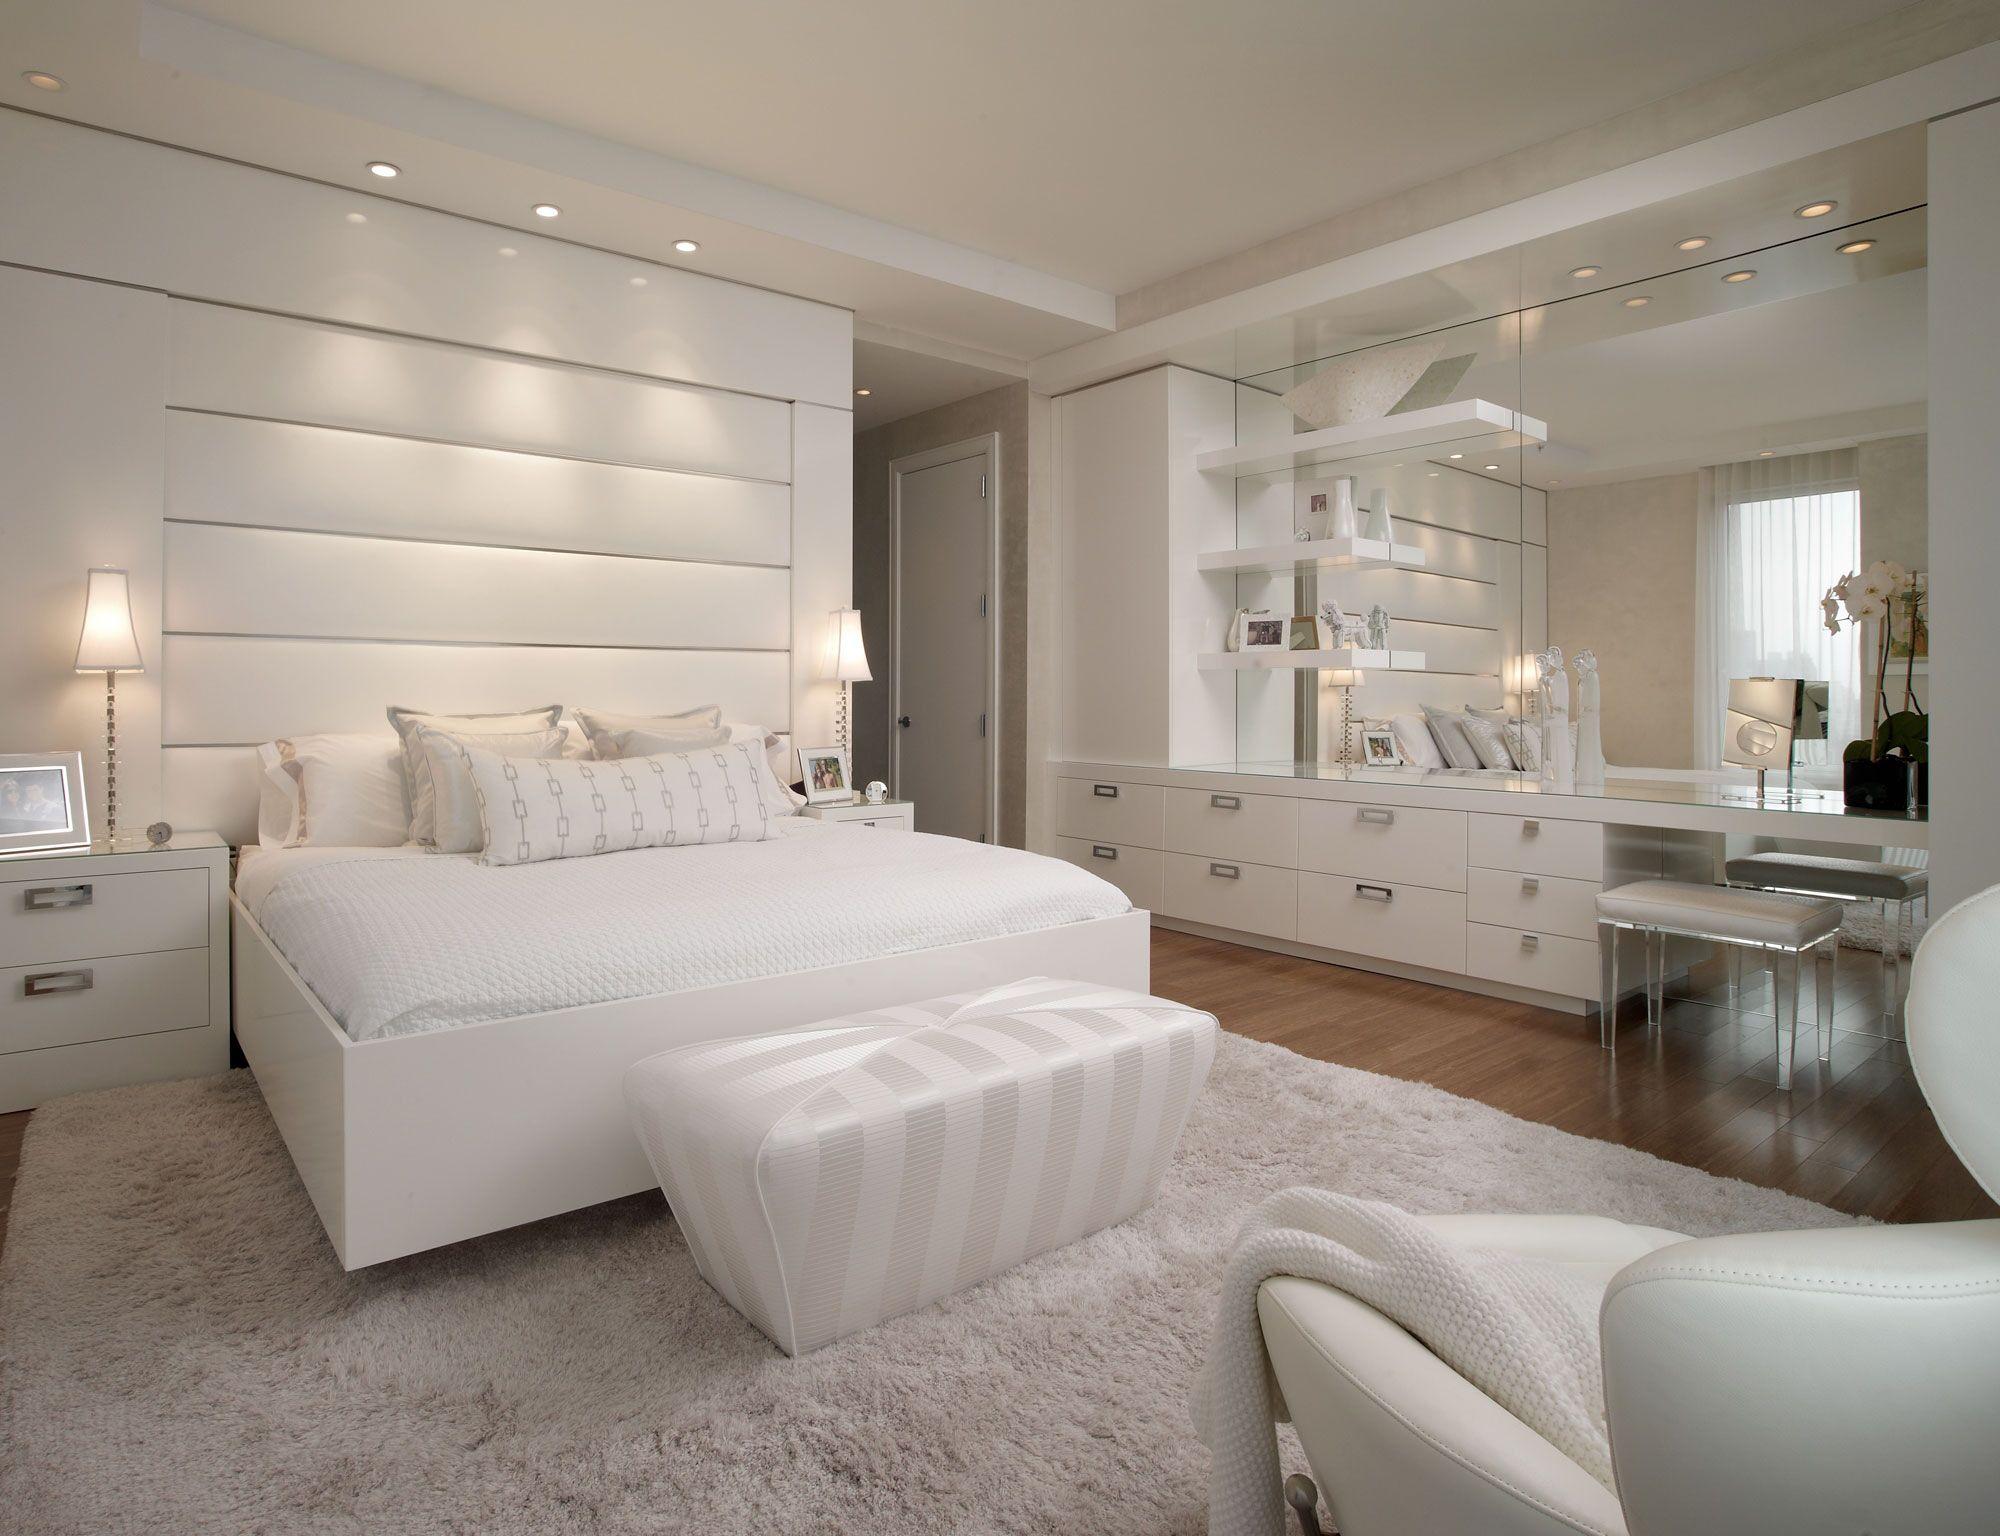 Elegant bedroom interior design all white  schlafzimmer  pinterest  dream rooms bedrooms and